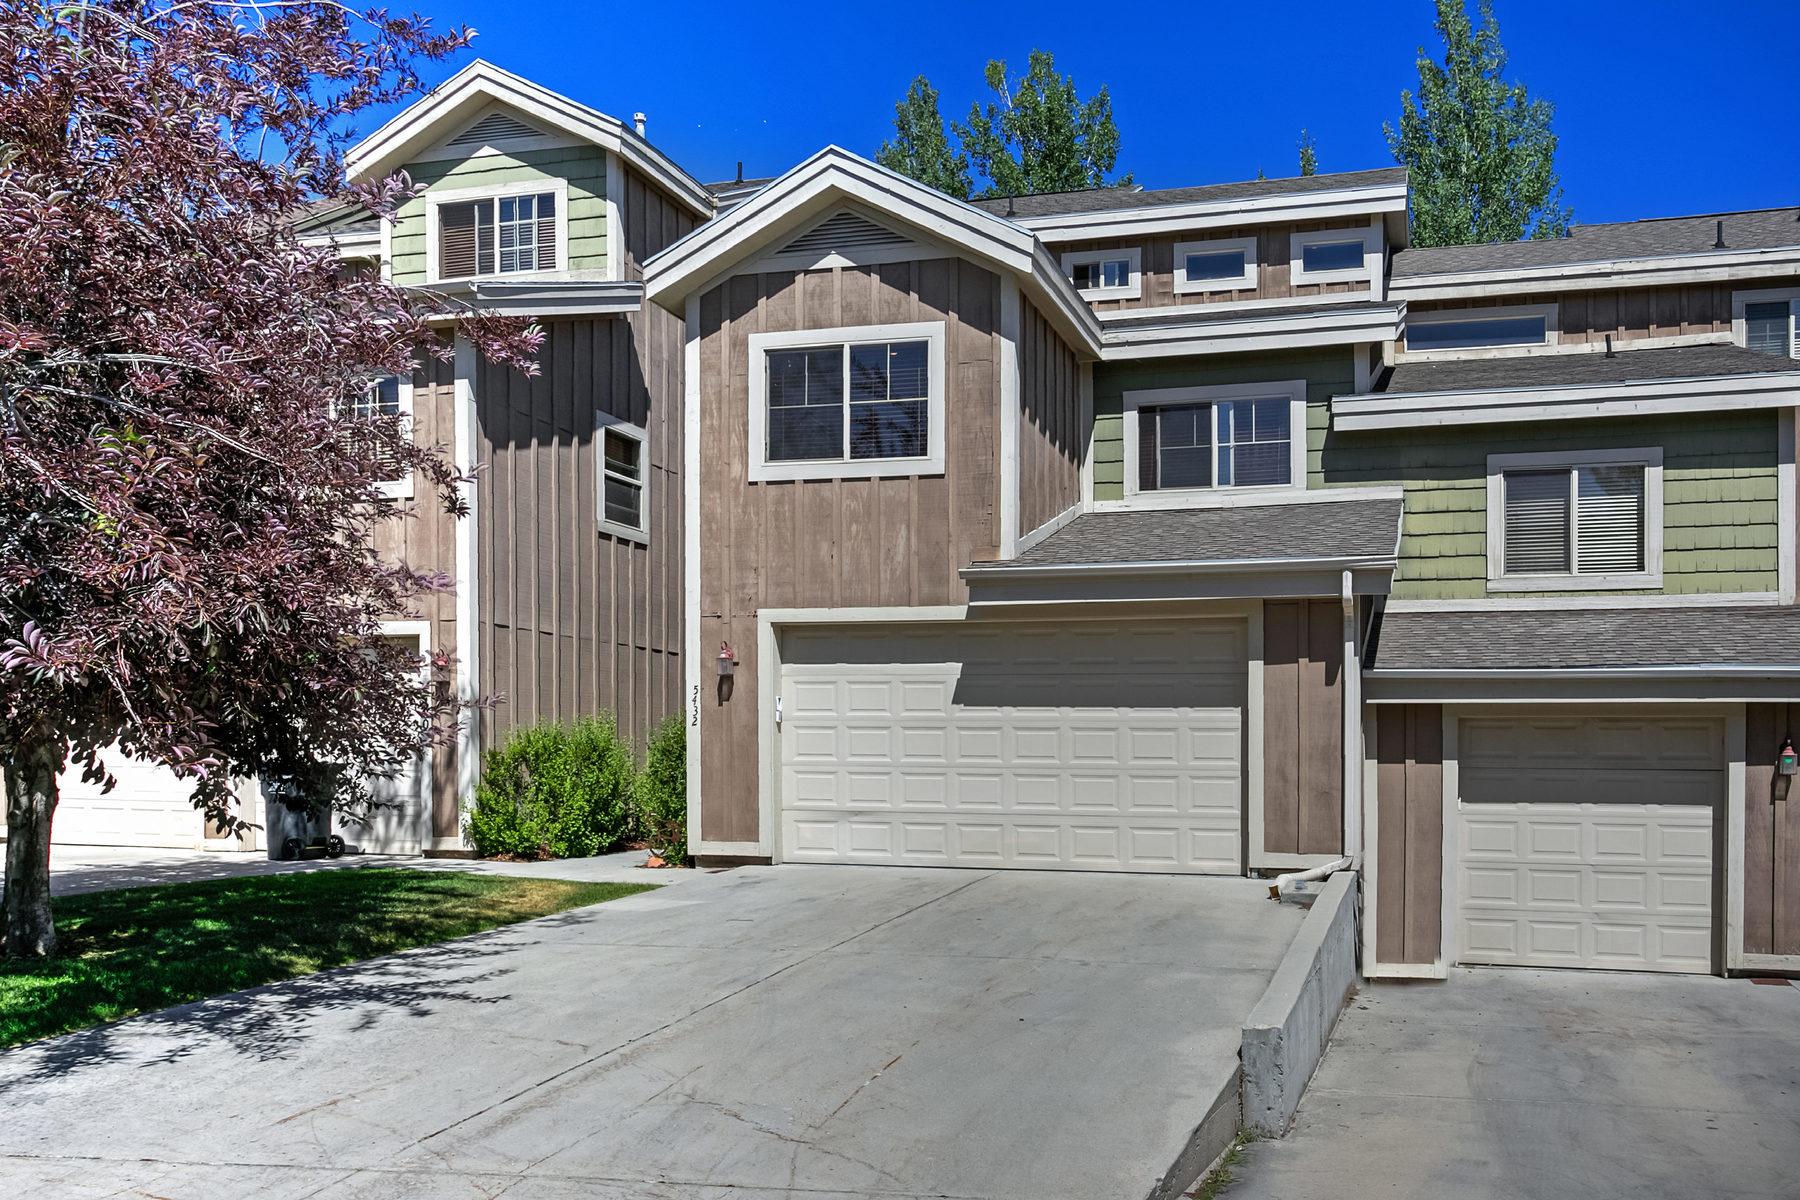 Residência urbana para Venda às Bright 3 Bedroom Unit in Bear Hollow 5432 Bobsled Blvd Park City, Utah, 84098 Estados Unidos